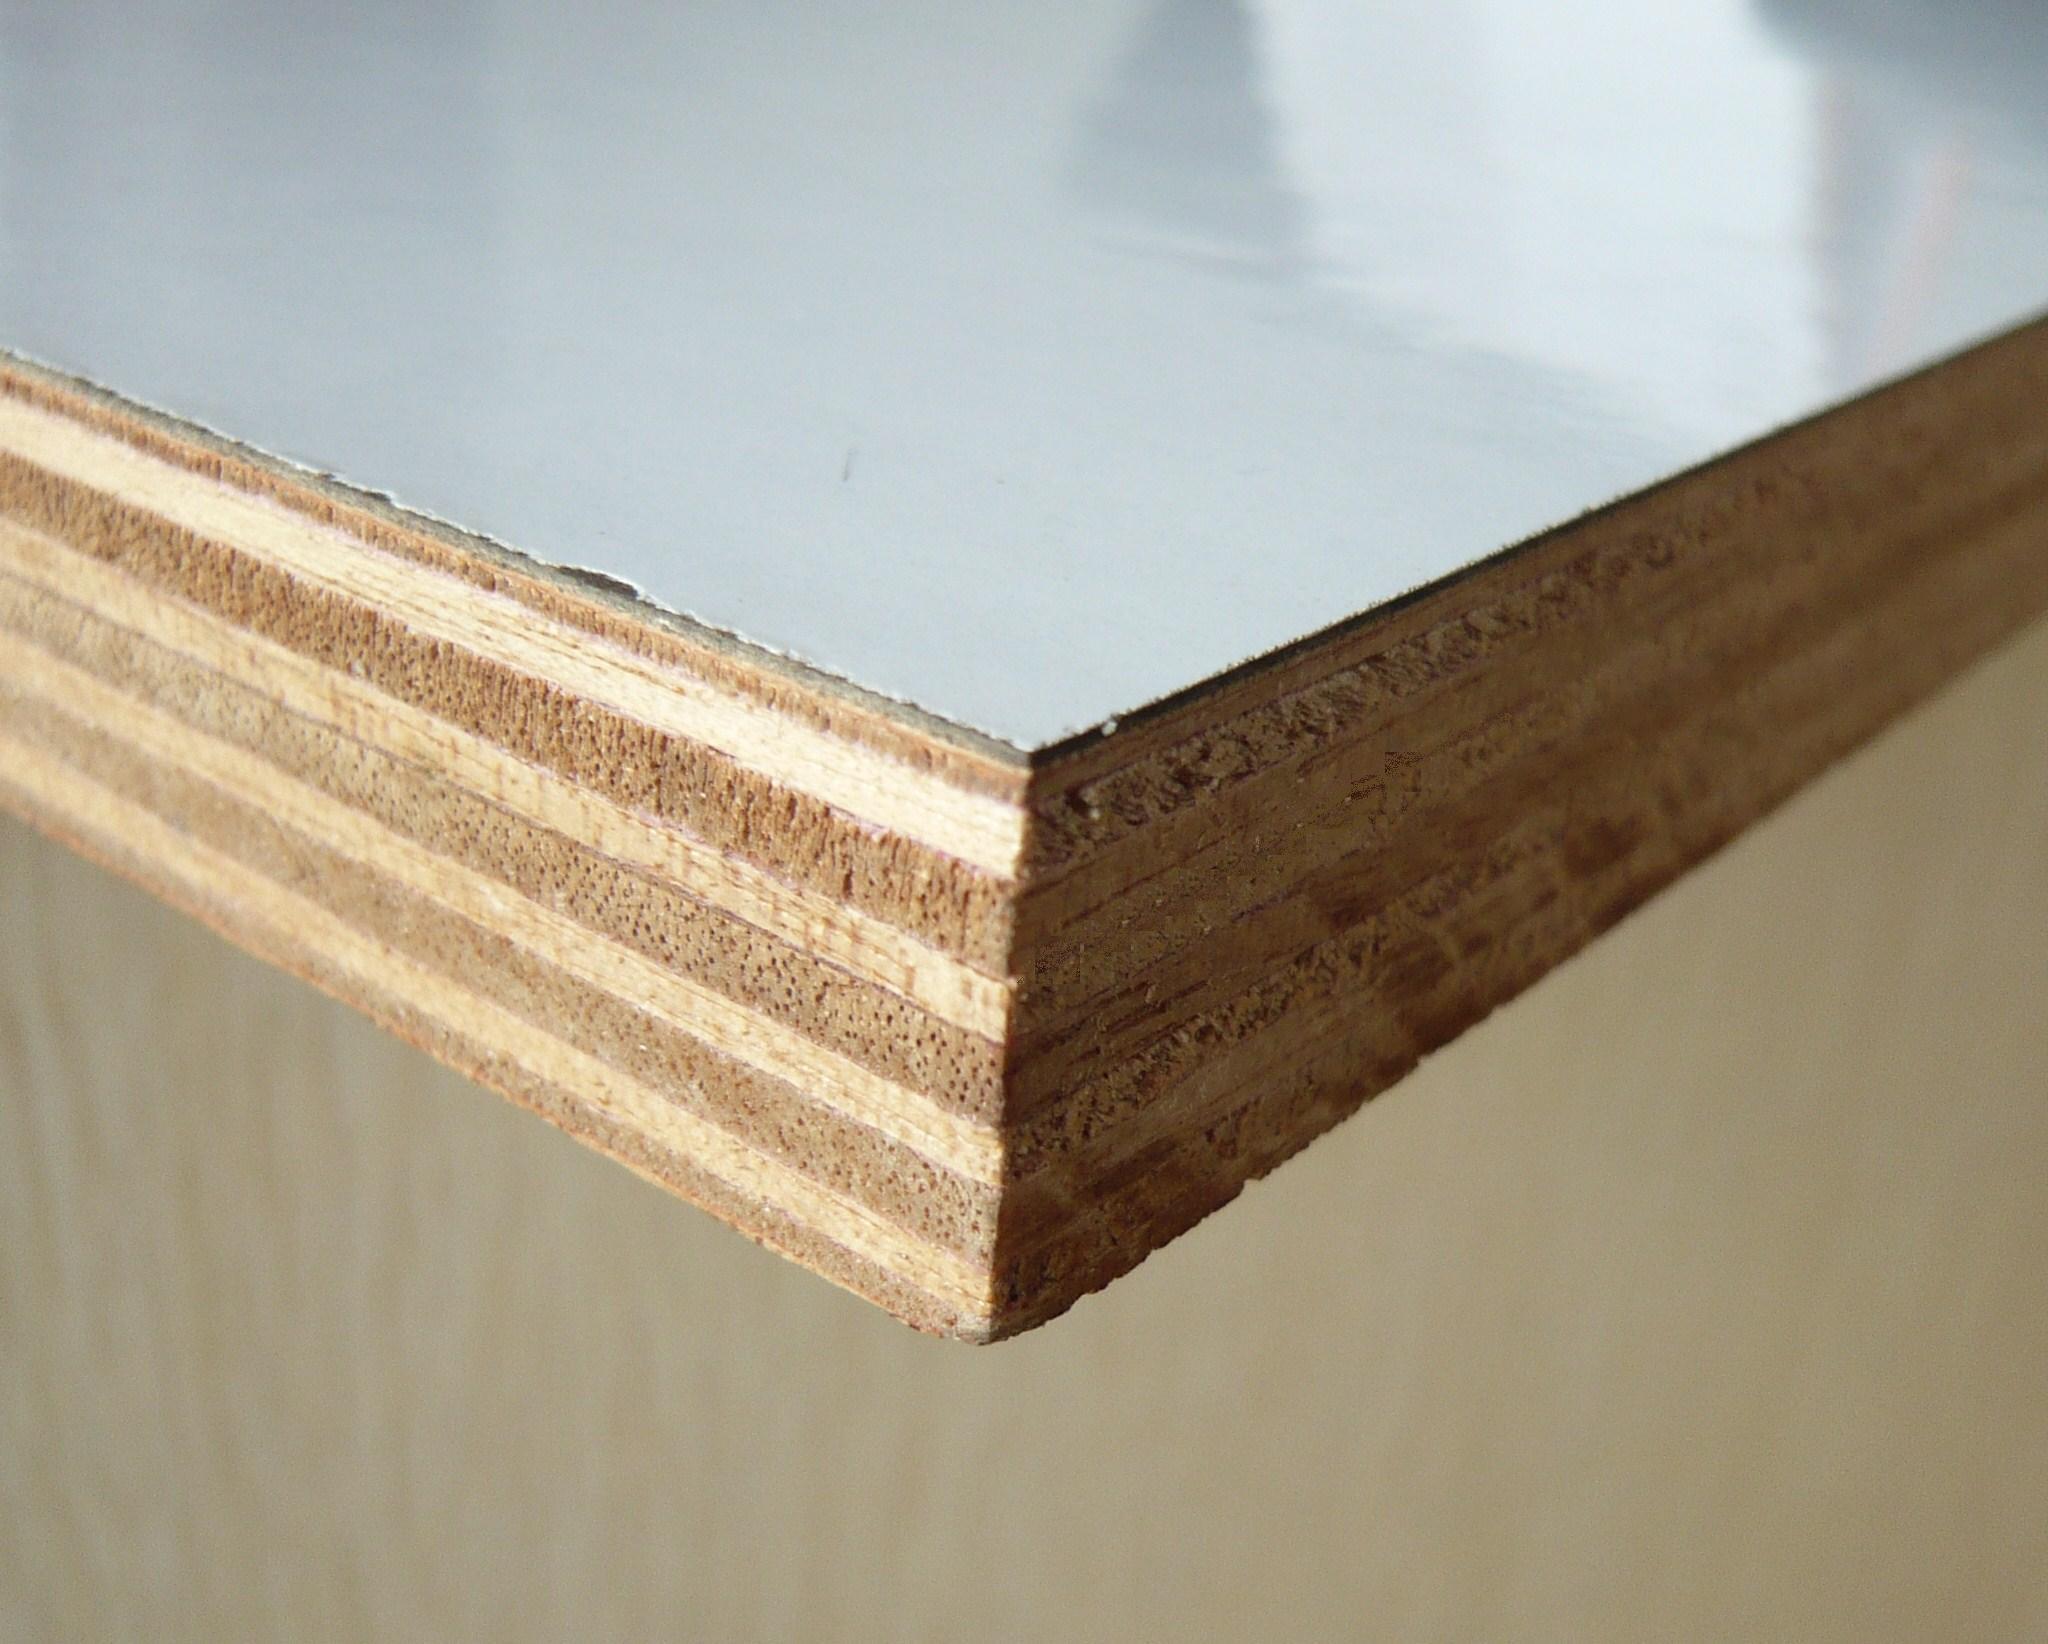 Madera contrachapada del formica madera contrachapada - Formica madera ...